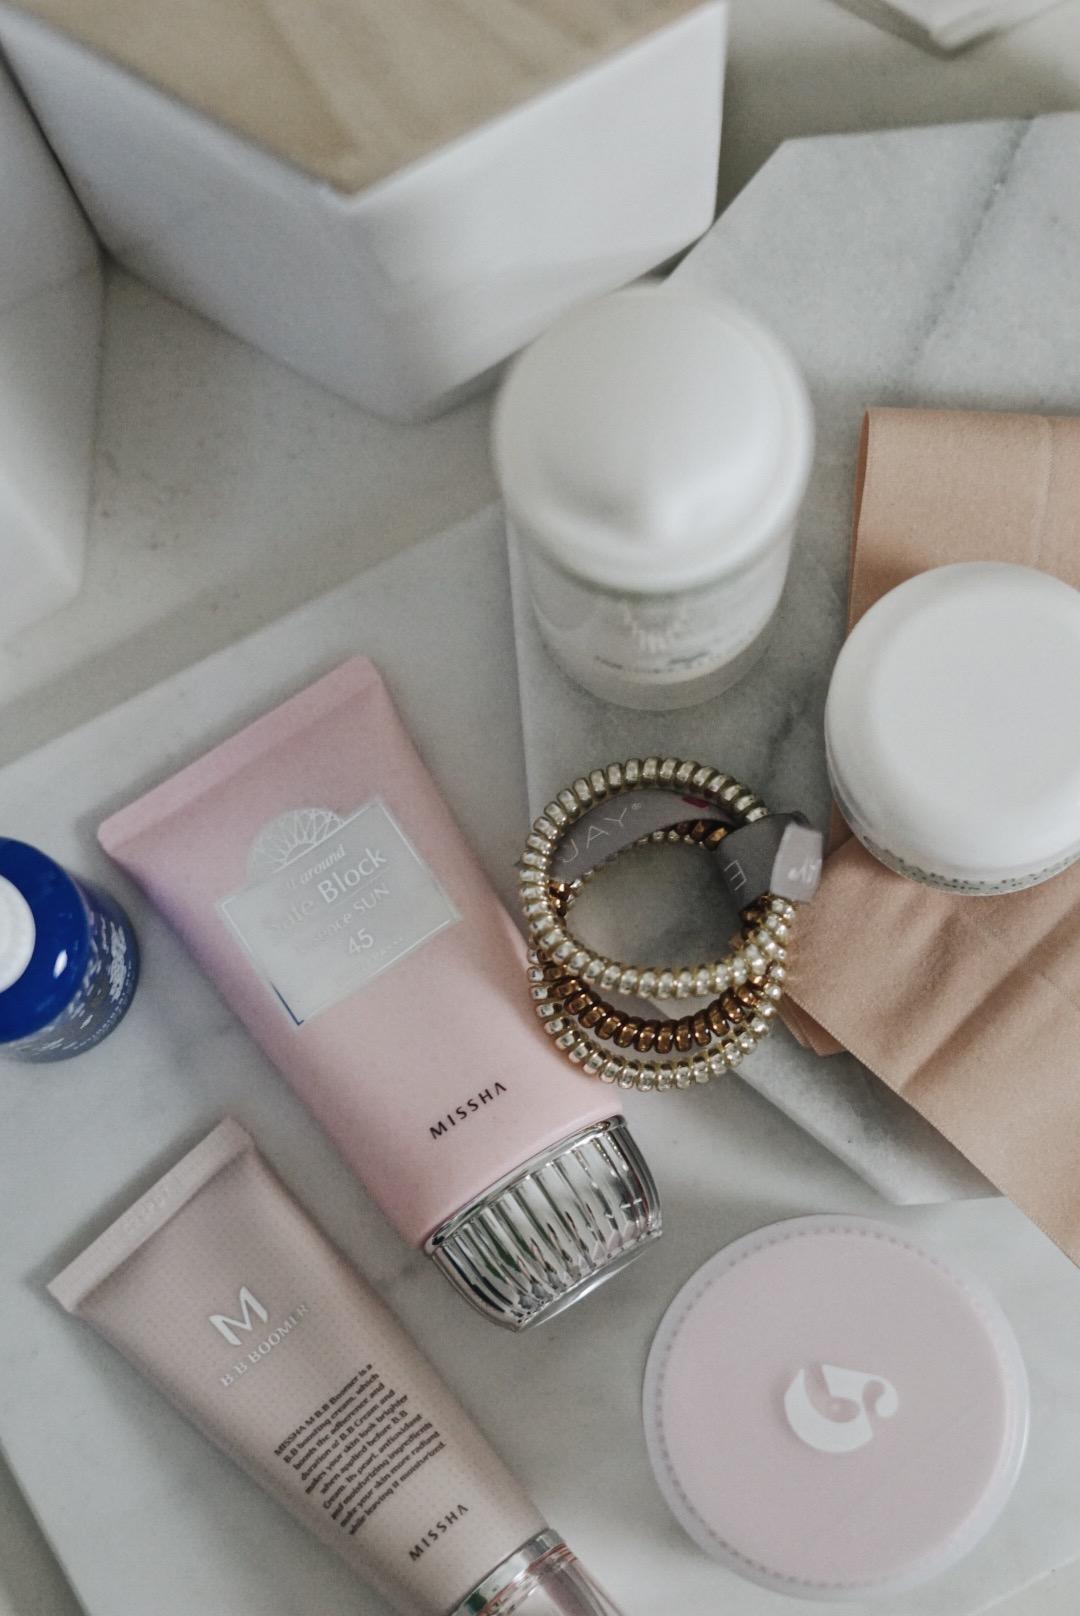 Skincare-Edit-Glossier-PMR-Missha-REN-mario-badescu-kypris